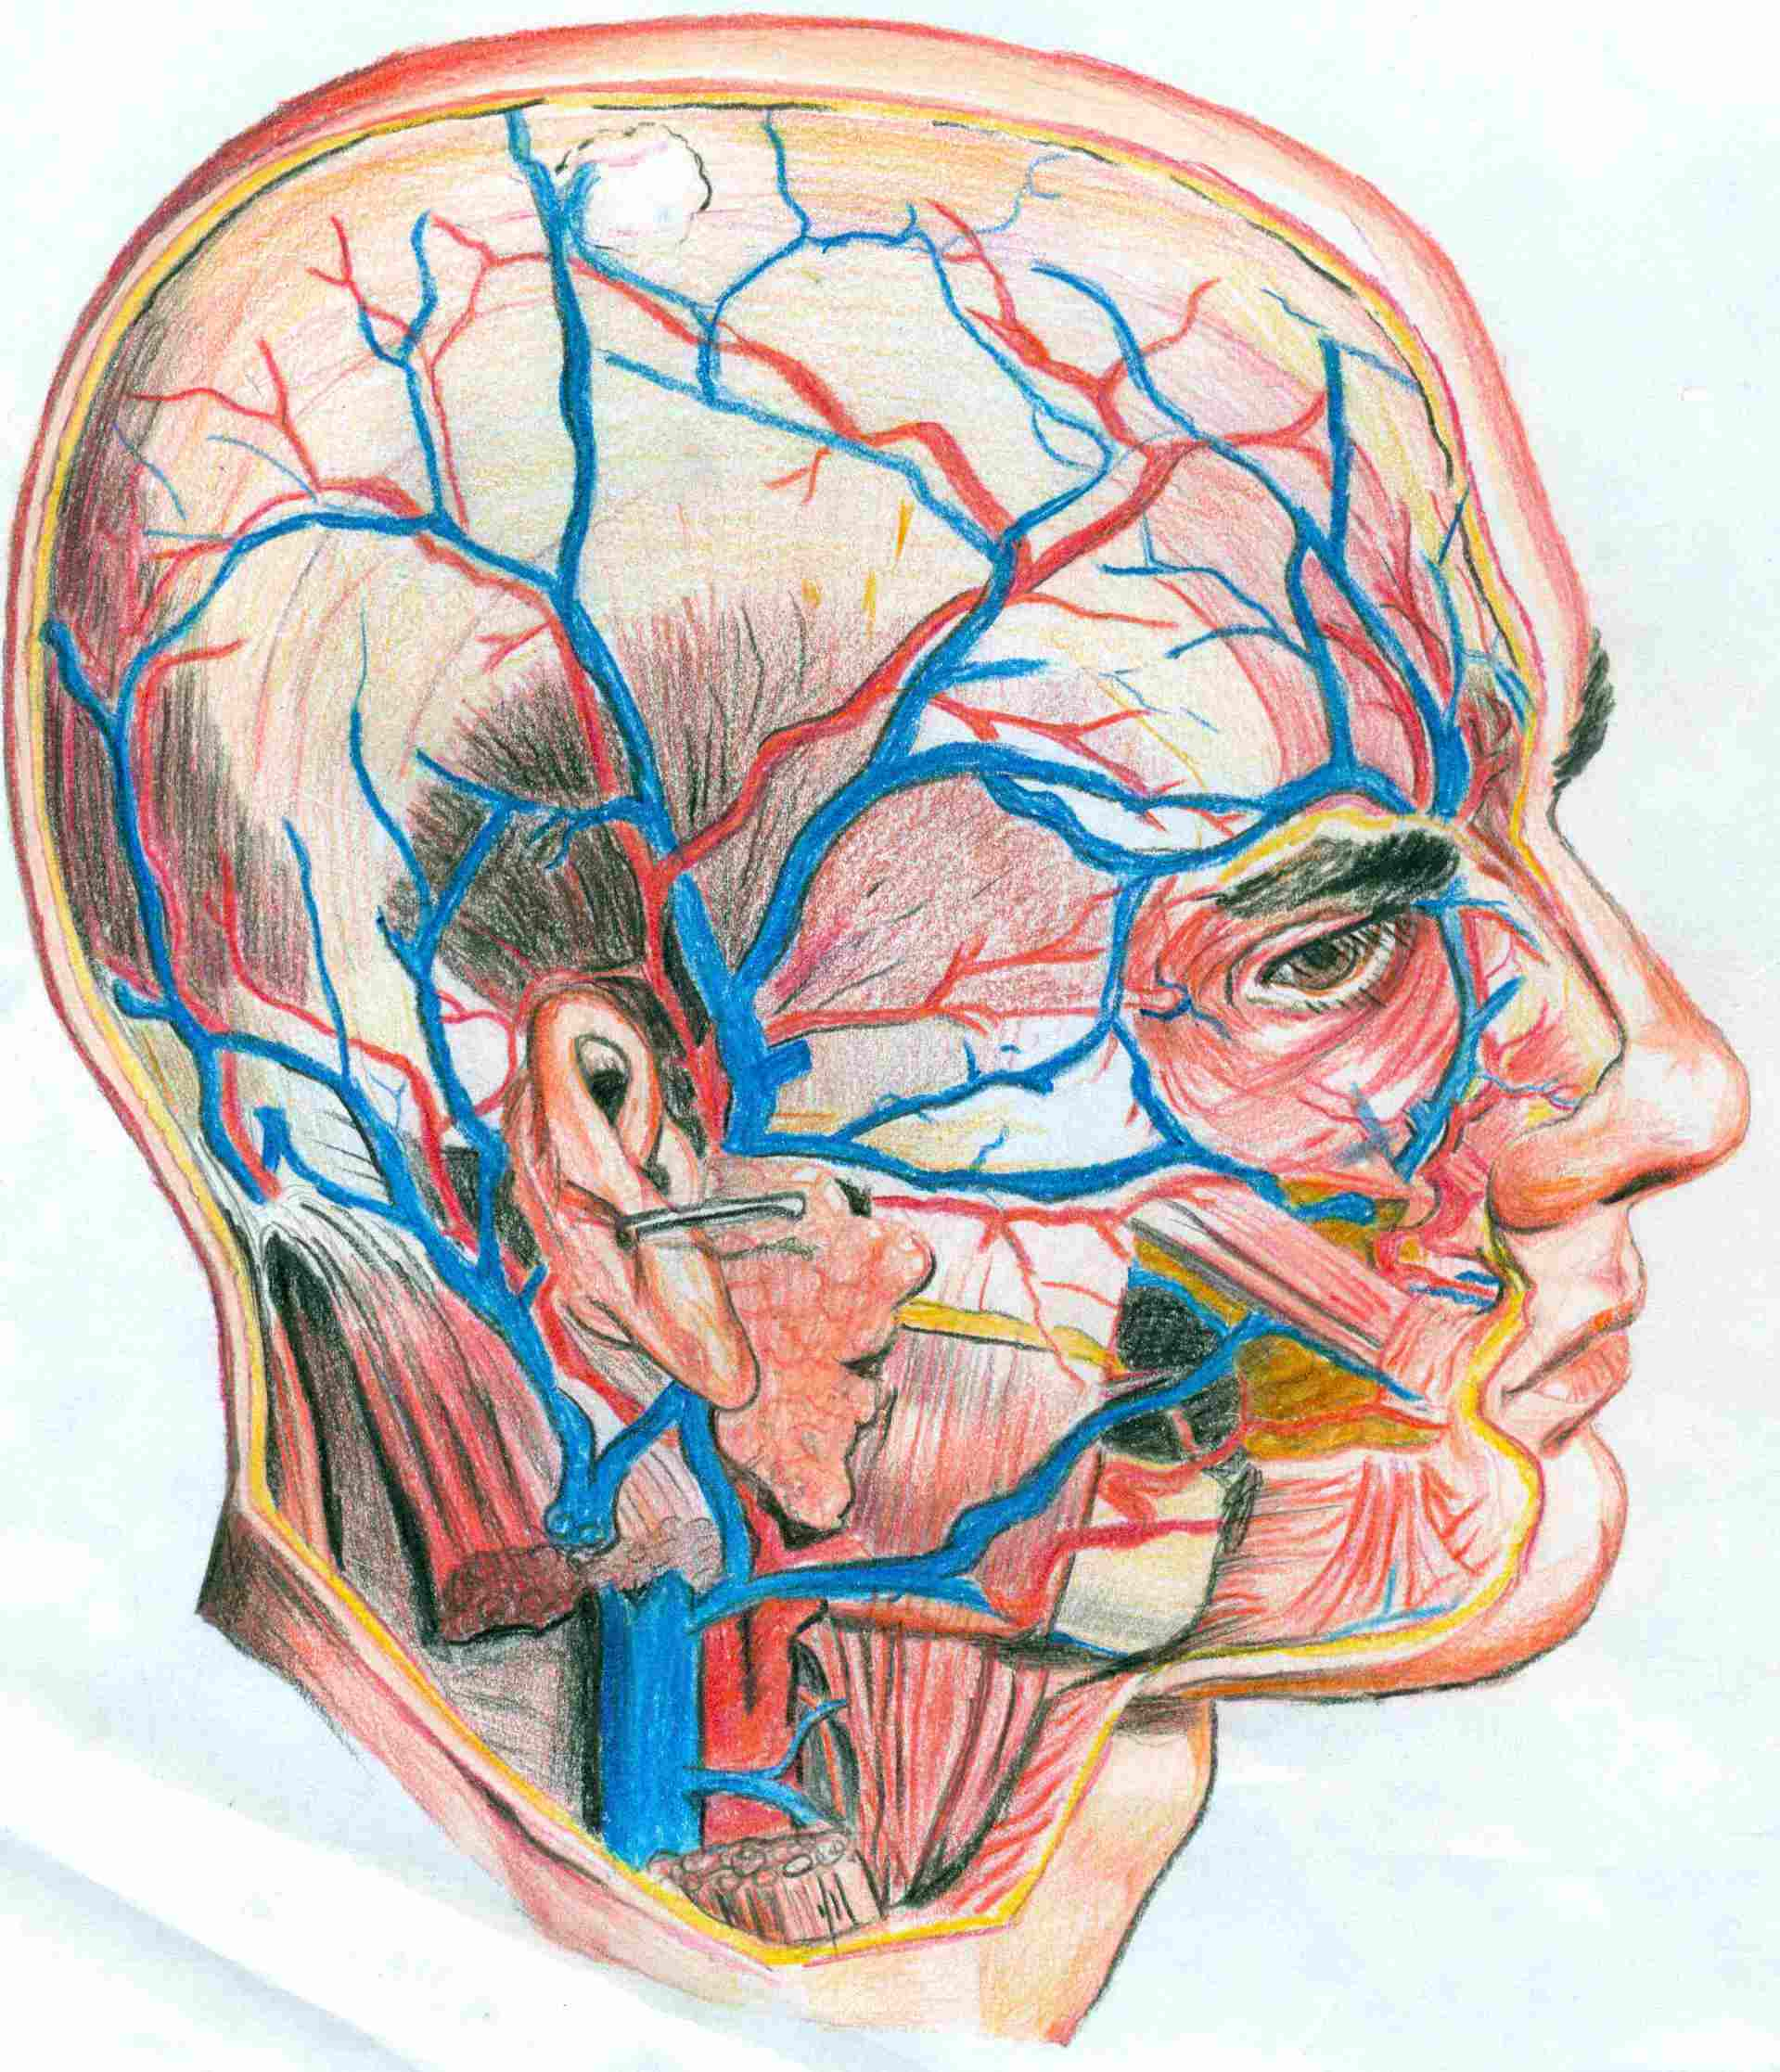 【第一弹】人体解剖绘图比赛